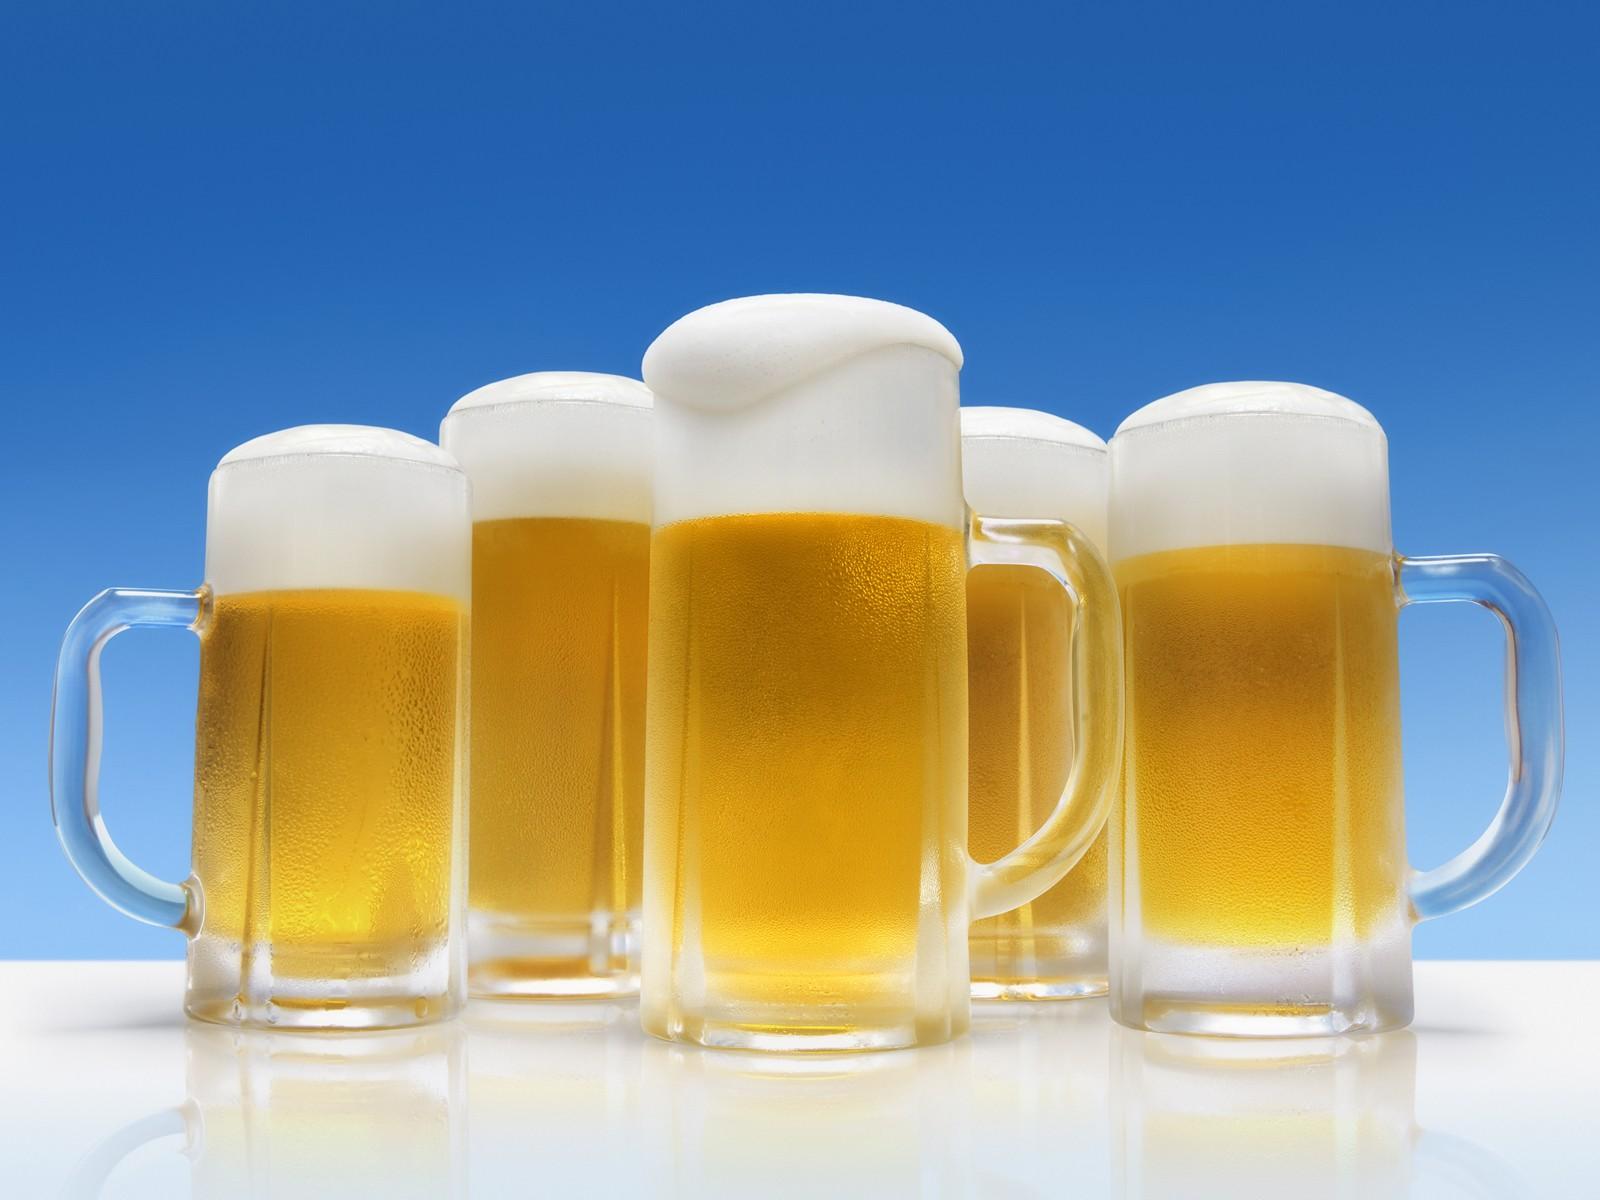 jw001 350a five glasses of foamy beer16001200